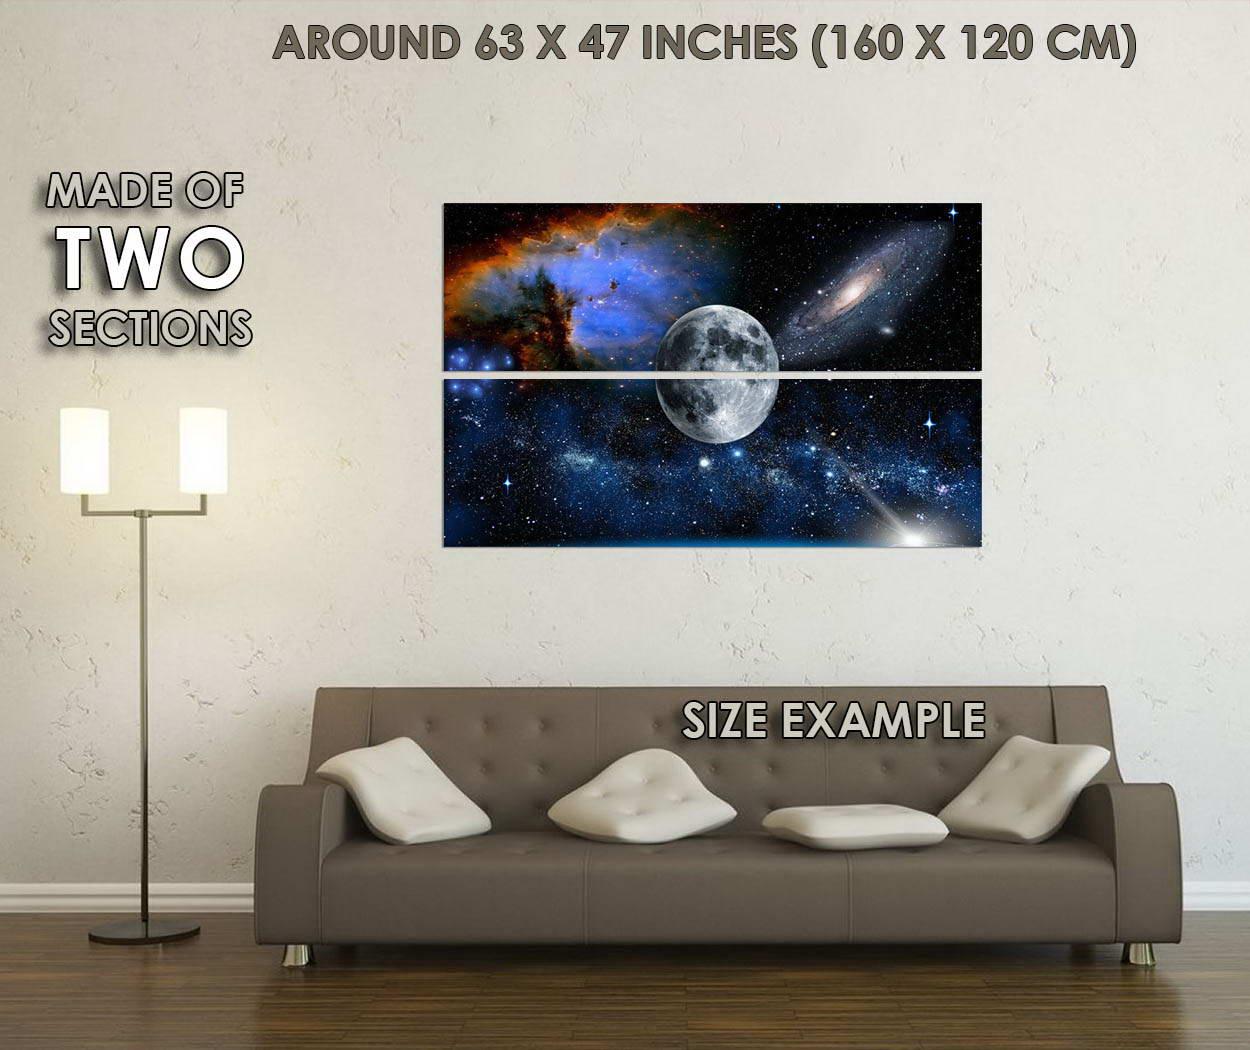 10285-The-Moon-Milky-Way-Universe-Galaxy-Science-LAMINATED-POSTER-CA thumbnail 6